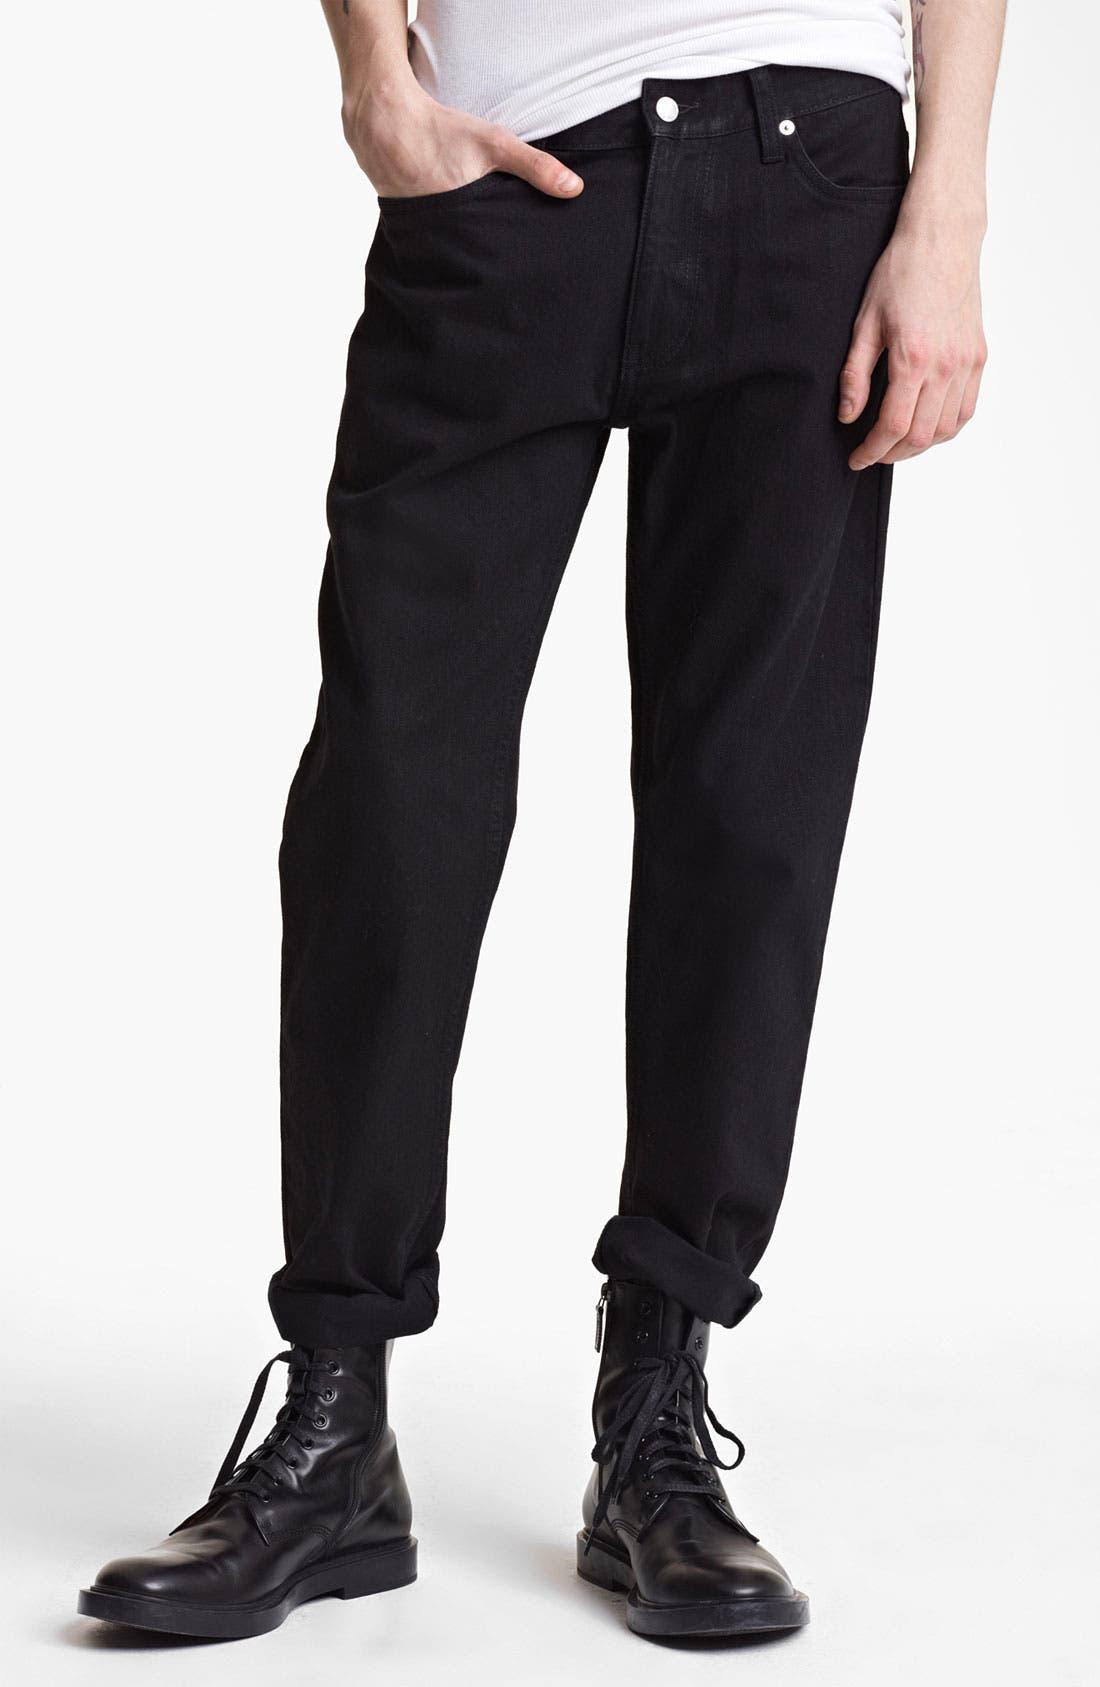 Main Image - BLK DNM 'Jeans 5' Slim Straight Coated Denim Jeans (Jet Black)